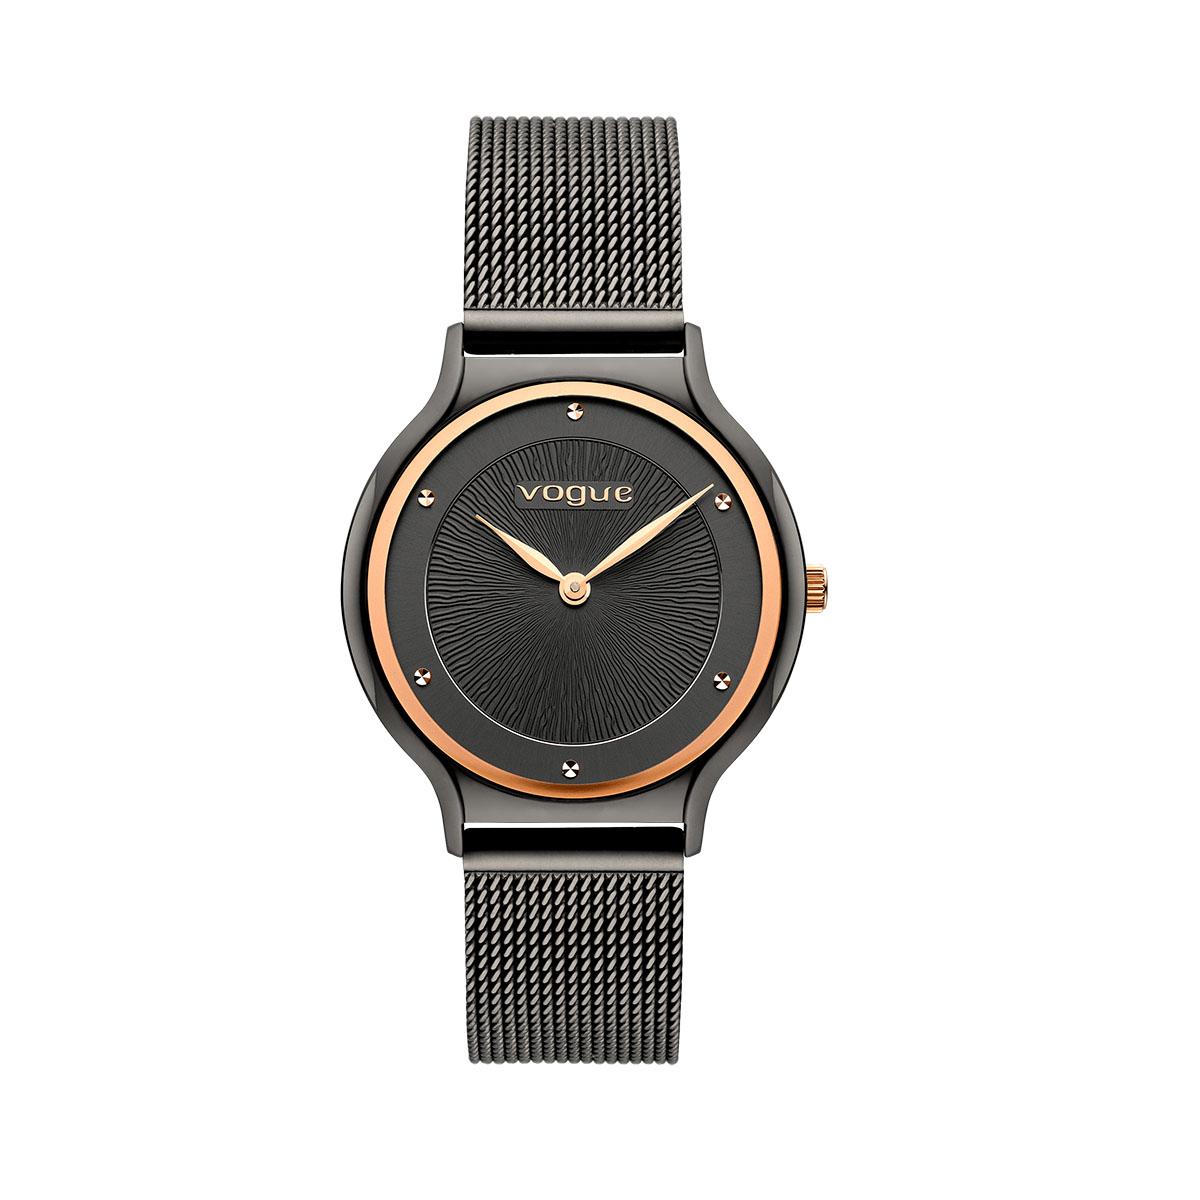 Crystal ρολόι ανθρακί καντράν